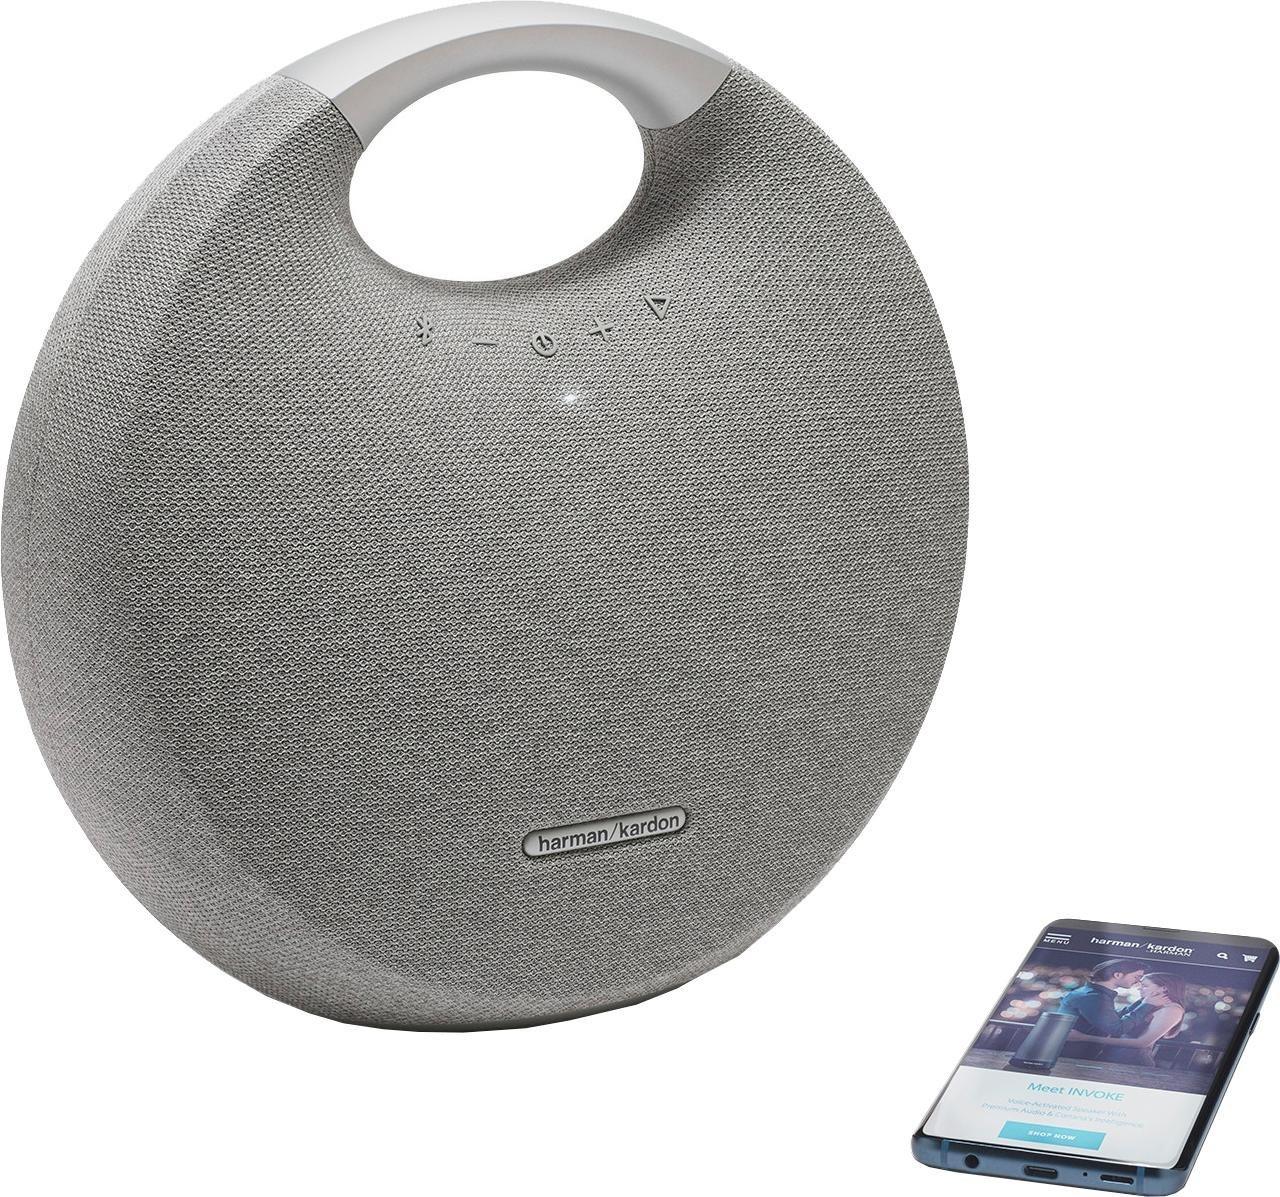 Onyx Studio 5 Portable-Lautsprecher (Bluetooth, 50 W)